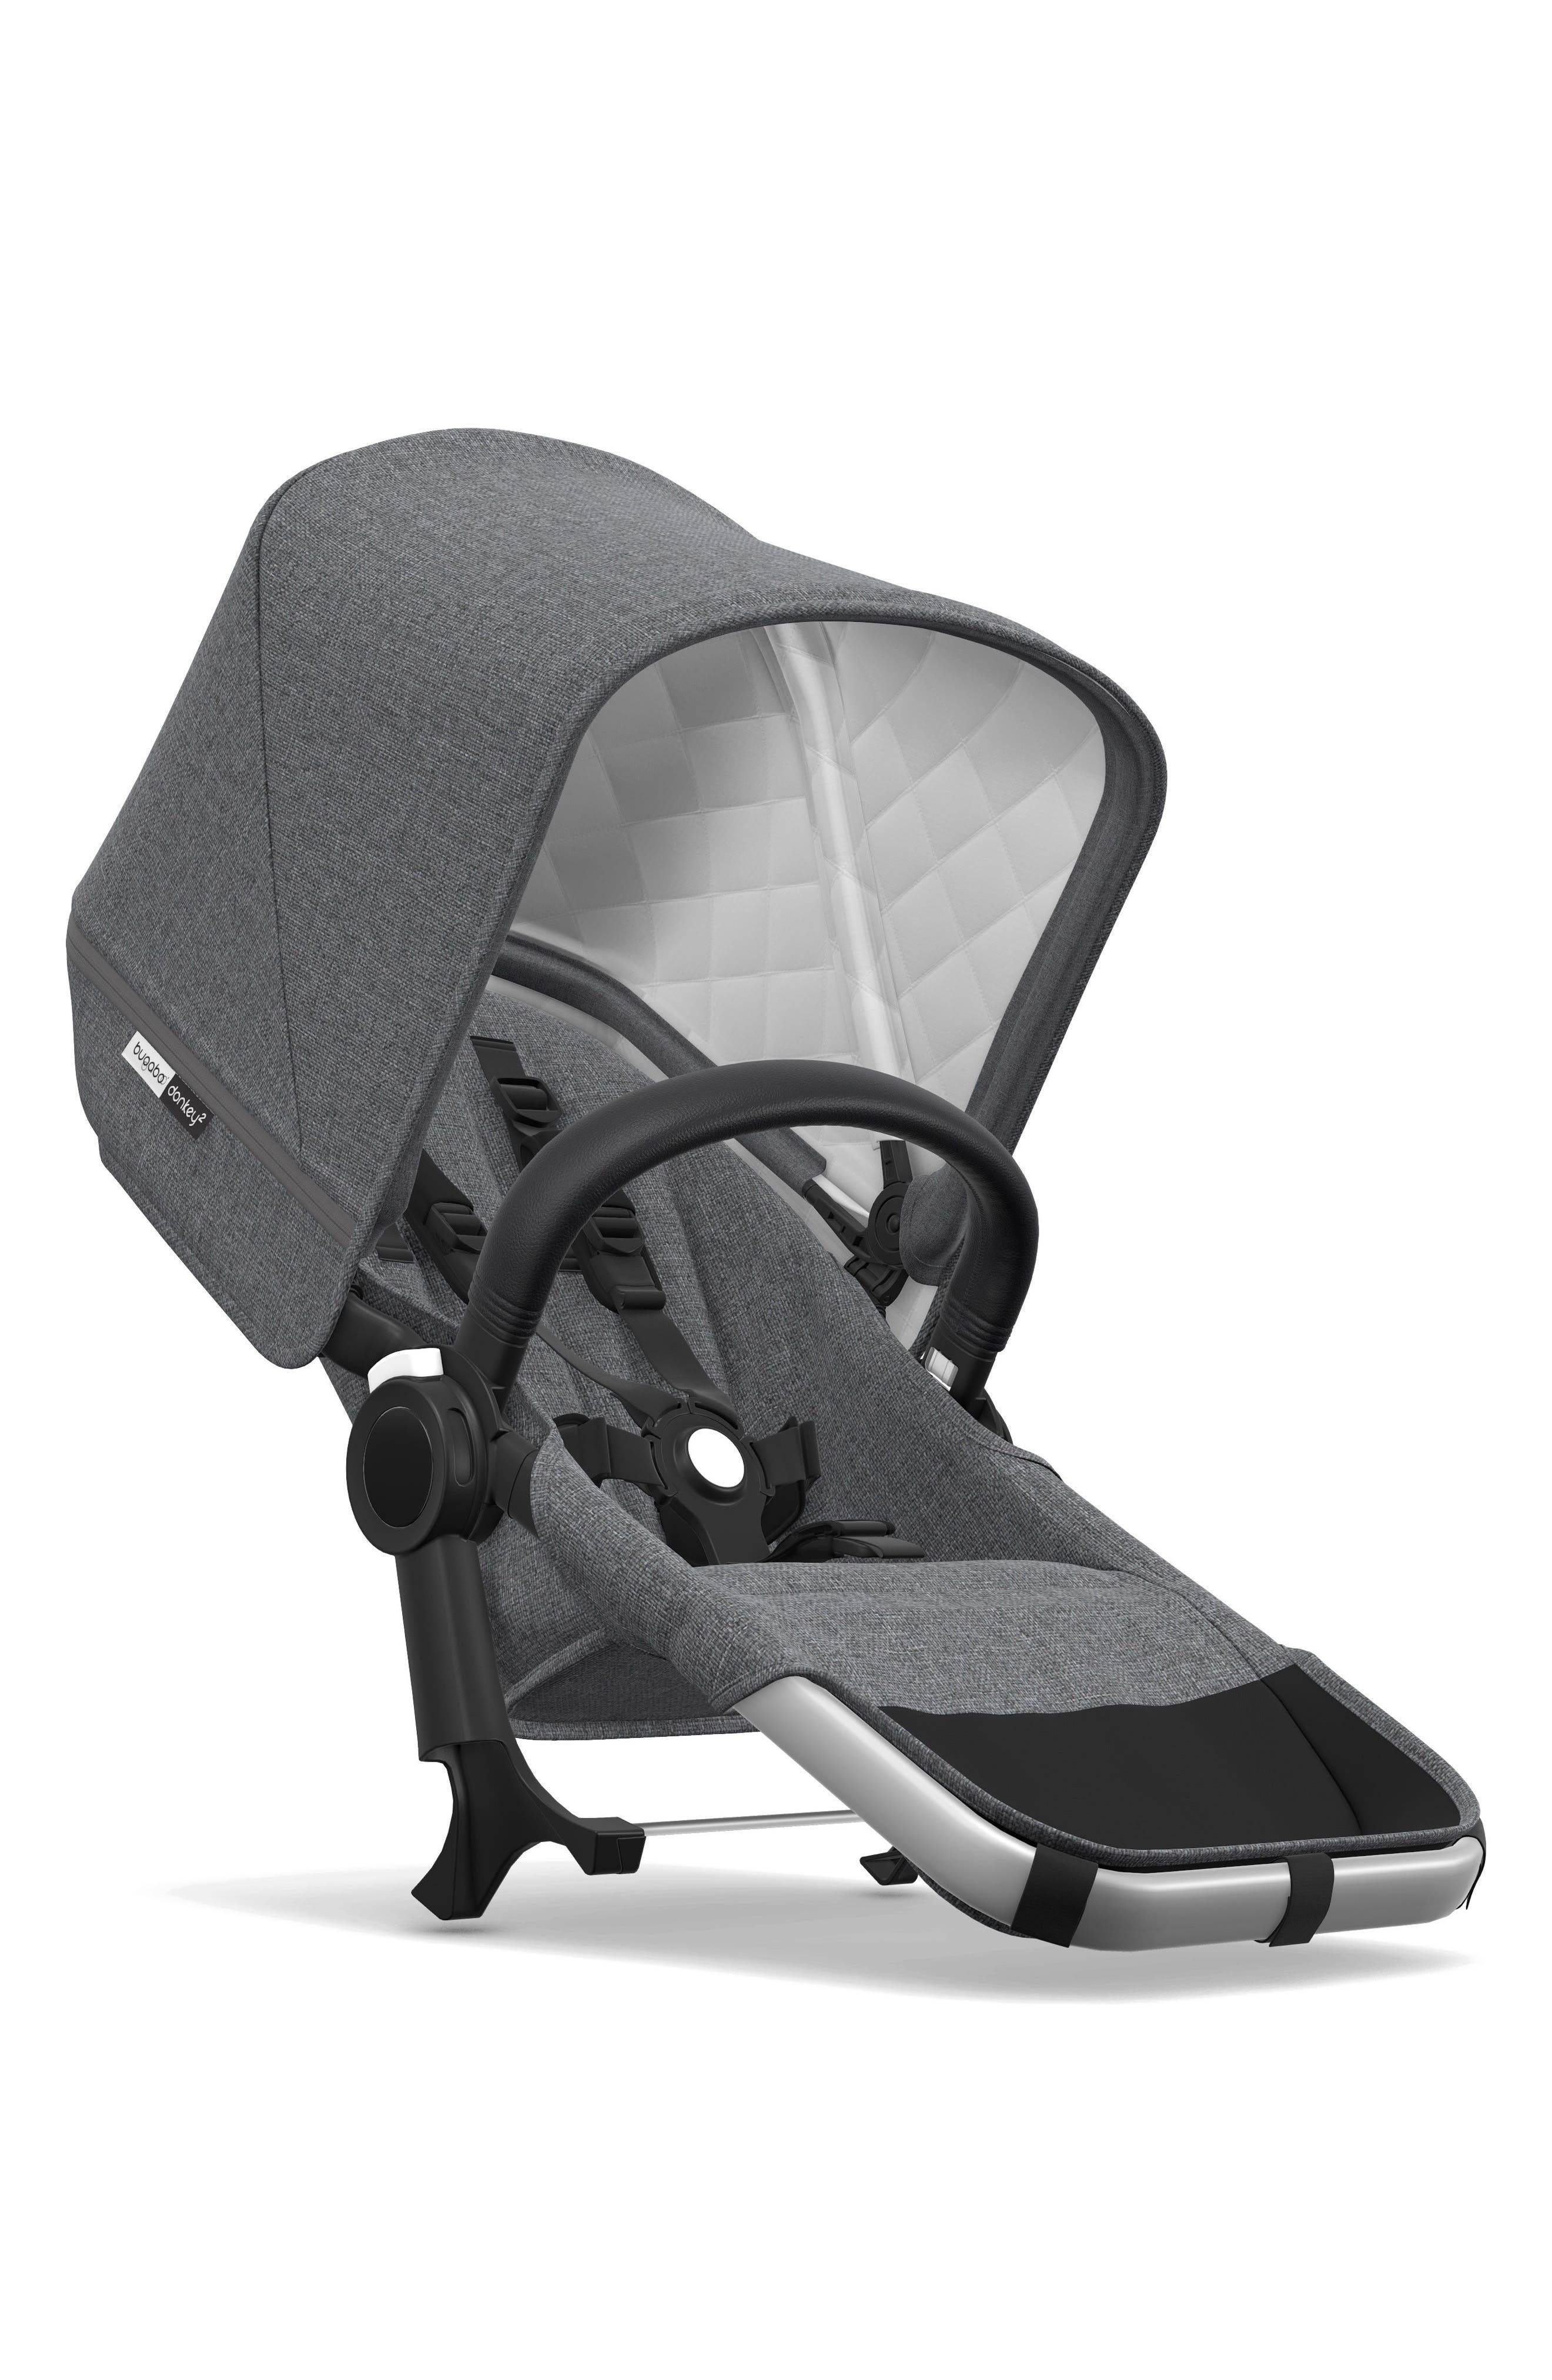 BUGABOO Frame Seat Extension for Donkey2 Stroller, Main, color, GREY MELANGE/ ALUMINUM